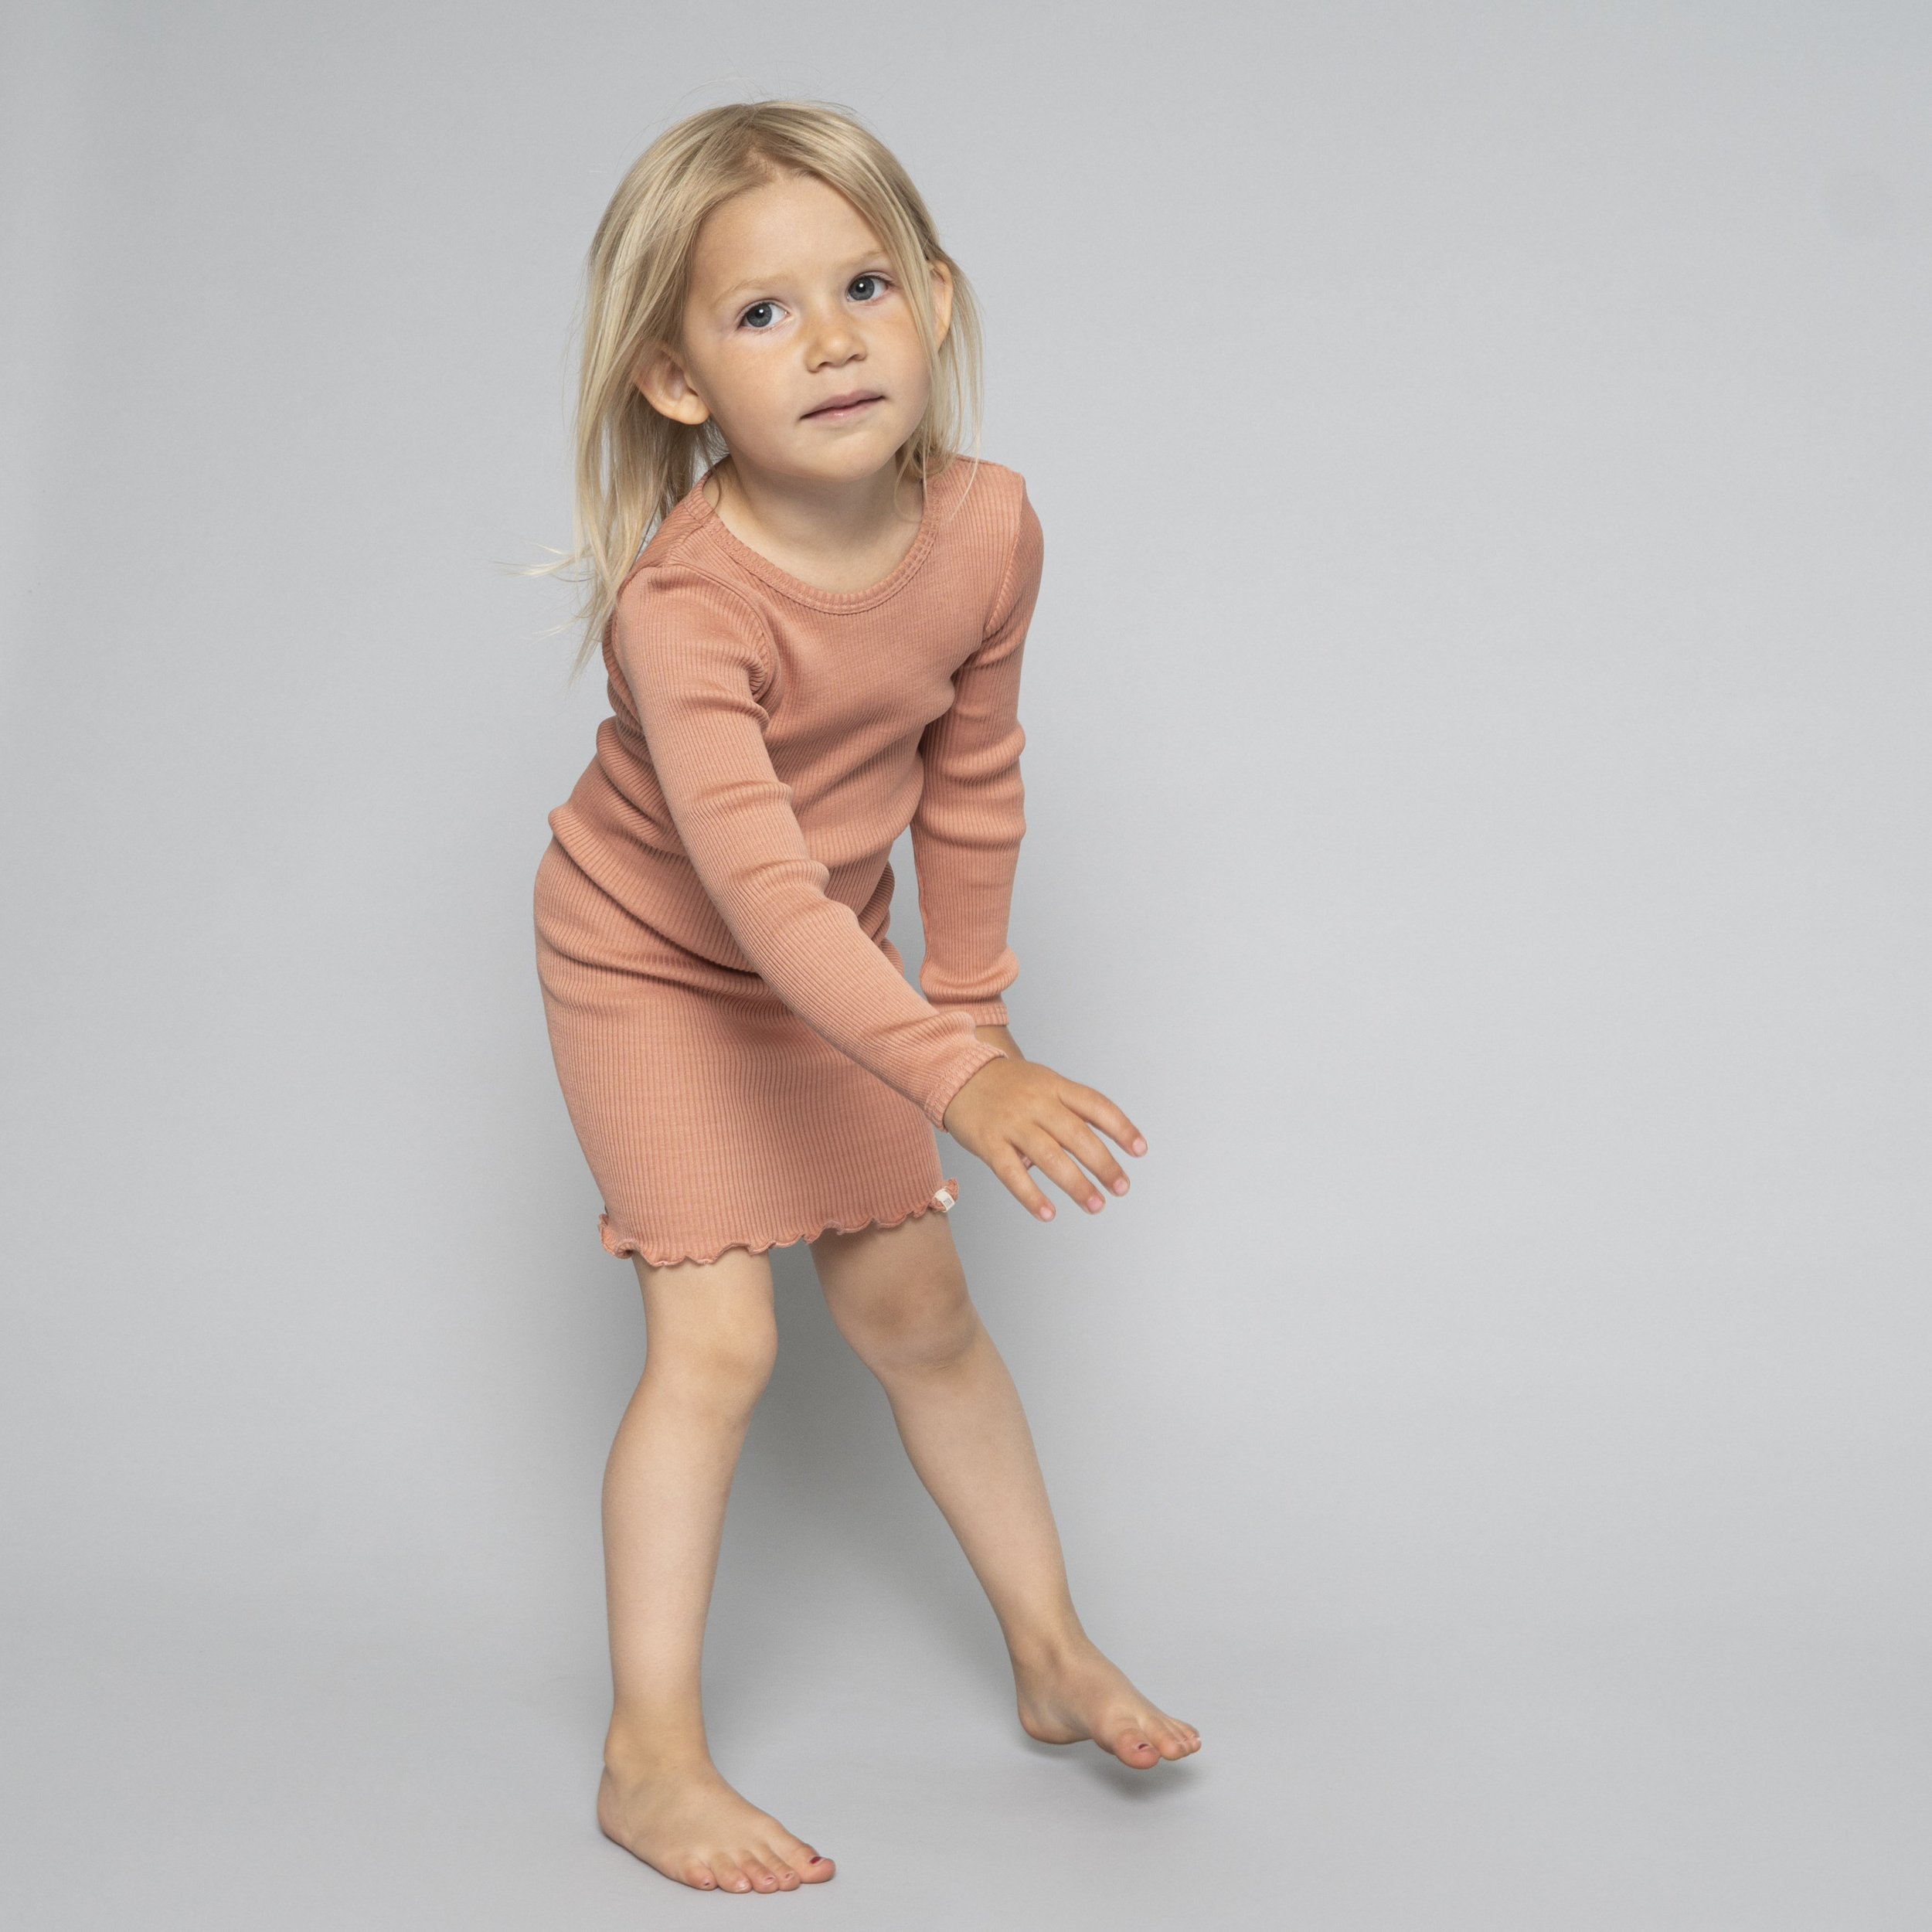 MINIMALISMA - Robe enfant - Soie 70% / coton 30% - Bina - Tan